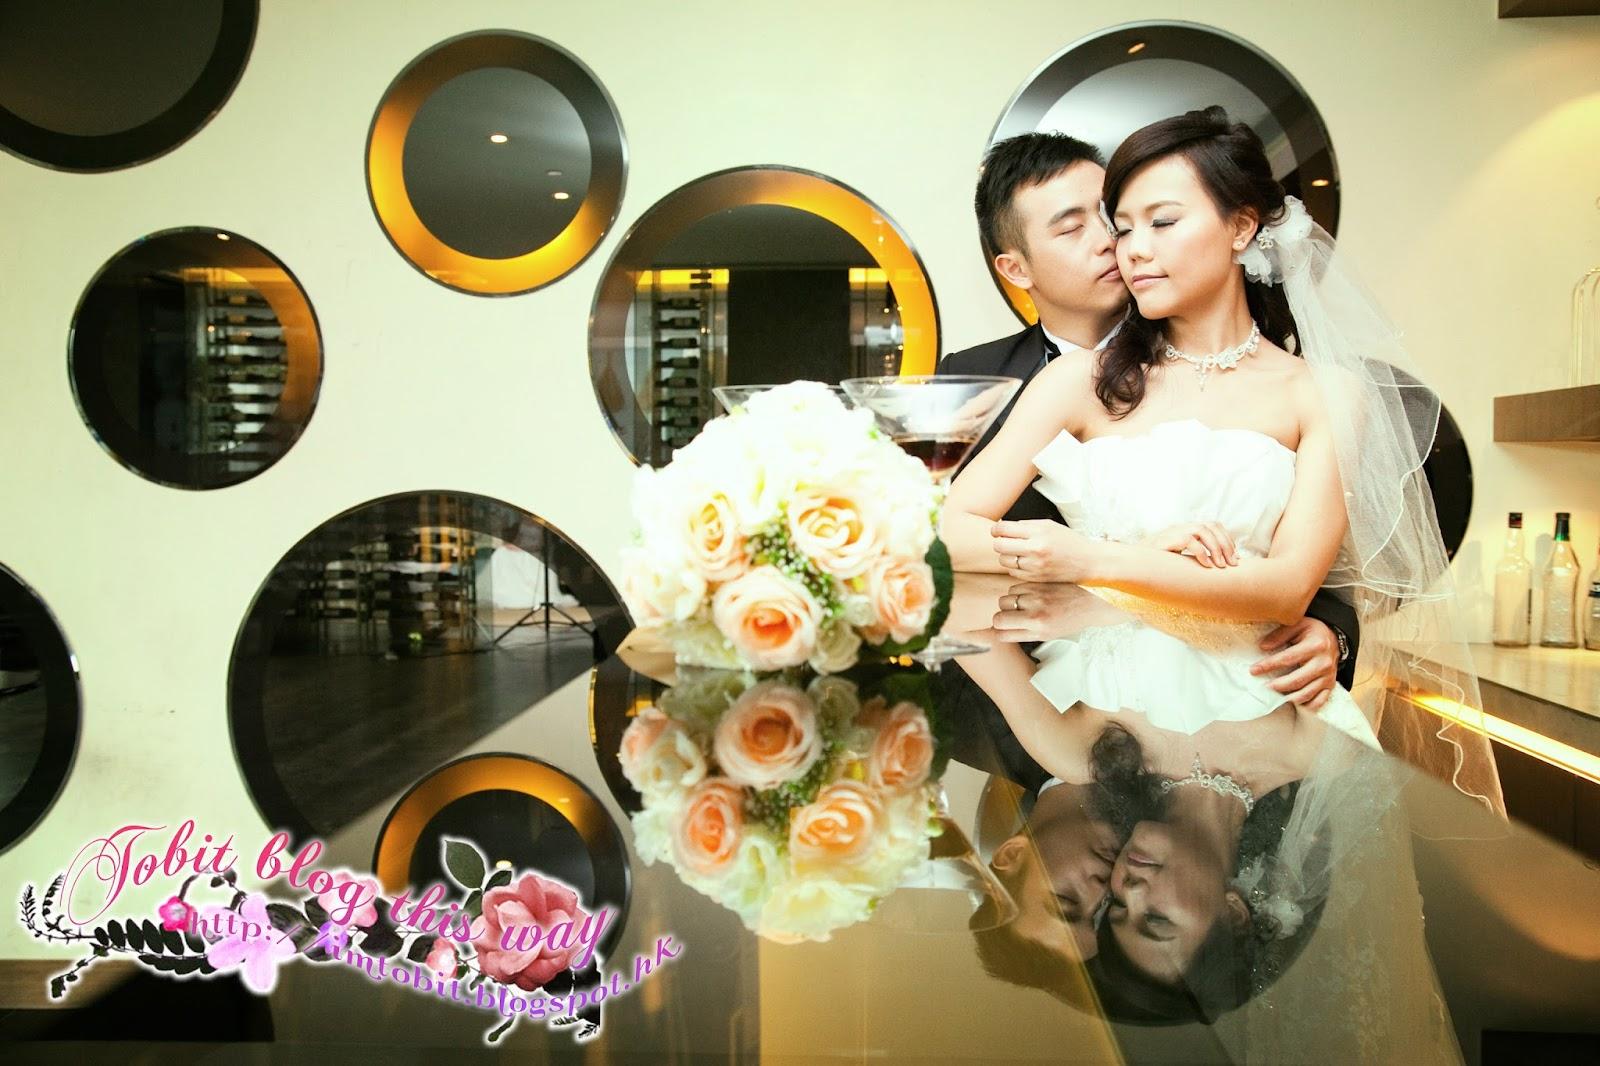 http://4.bp.blogspot.com/-FRukY1sUILw/U_DLbCA1yVI/AAAAAAAAZTA/cTRlAgeBwxs/s1600/prewedding_monalisa.jpg